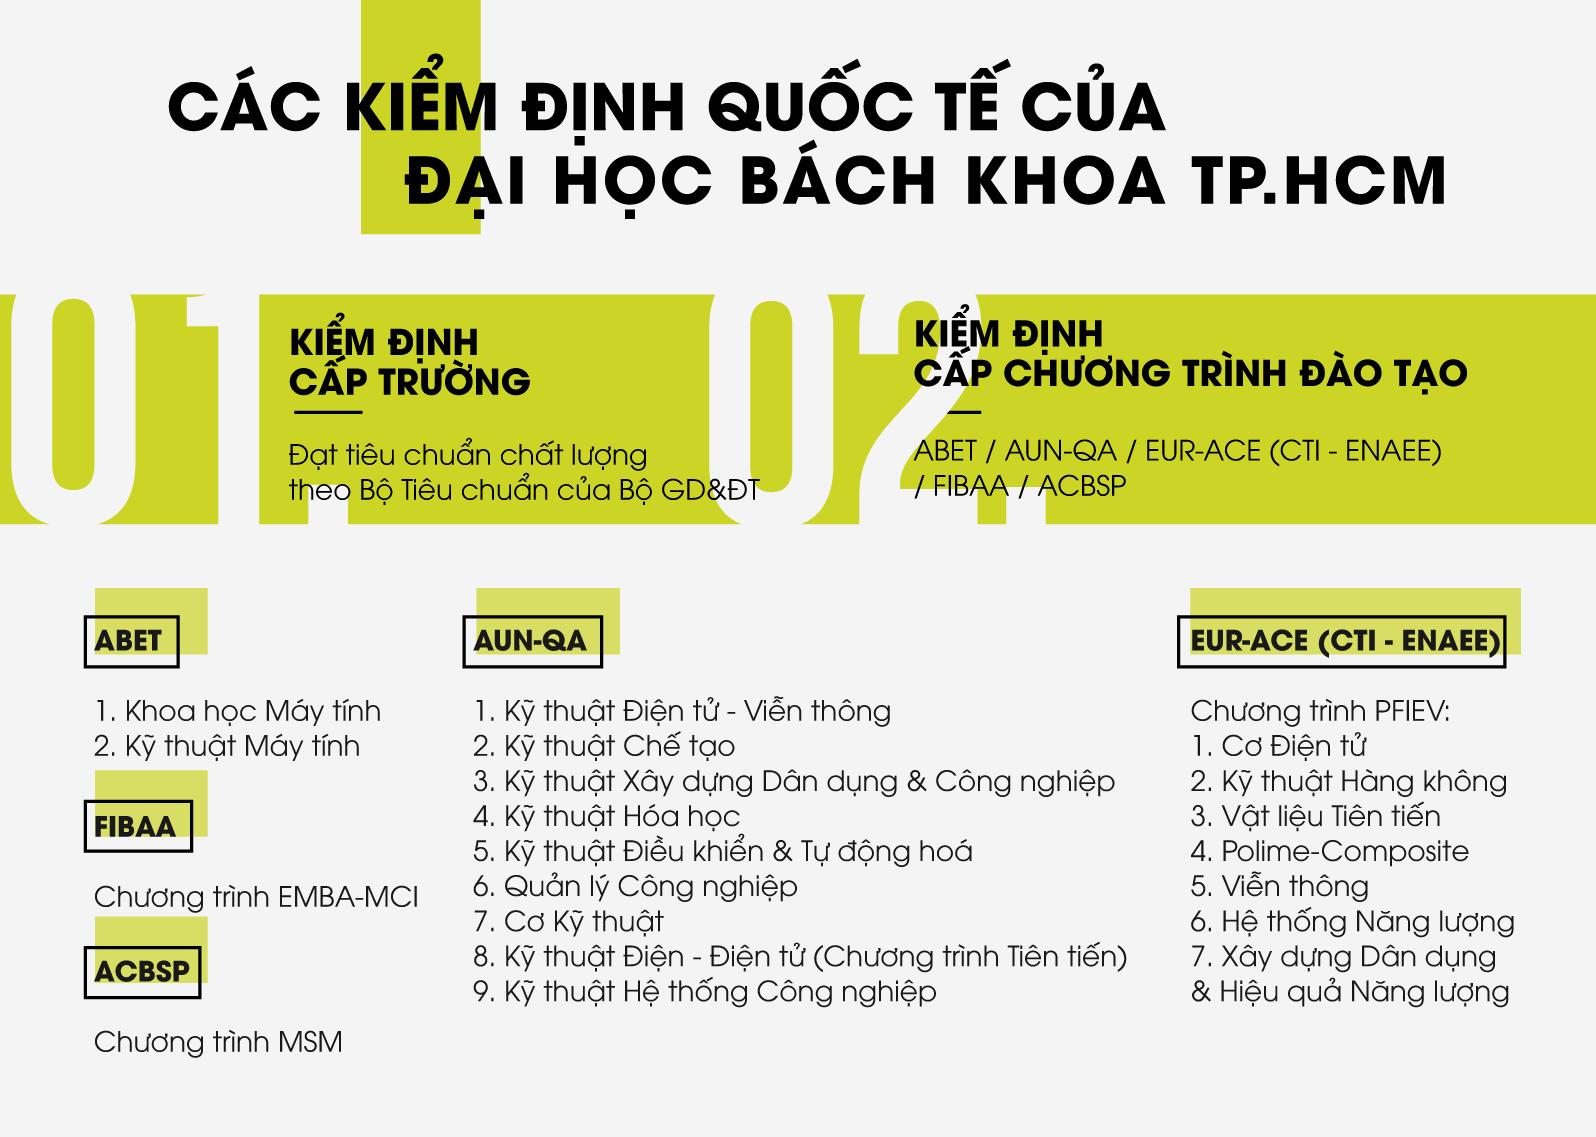 Cac chuong trinh dat kiem dinh quoc te